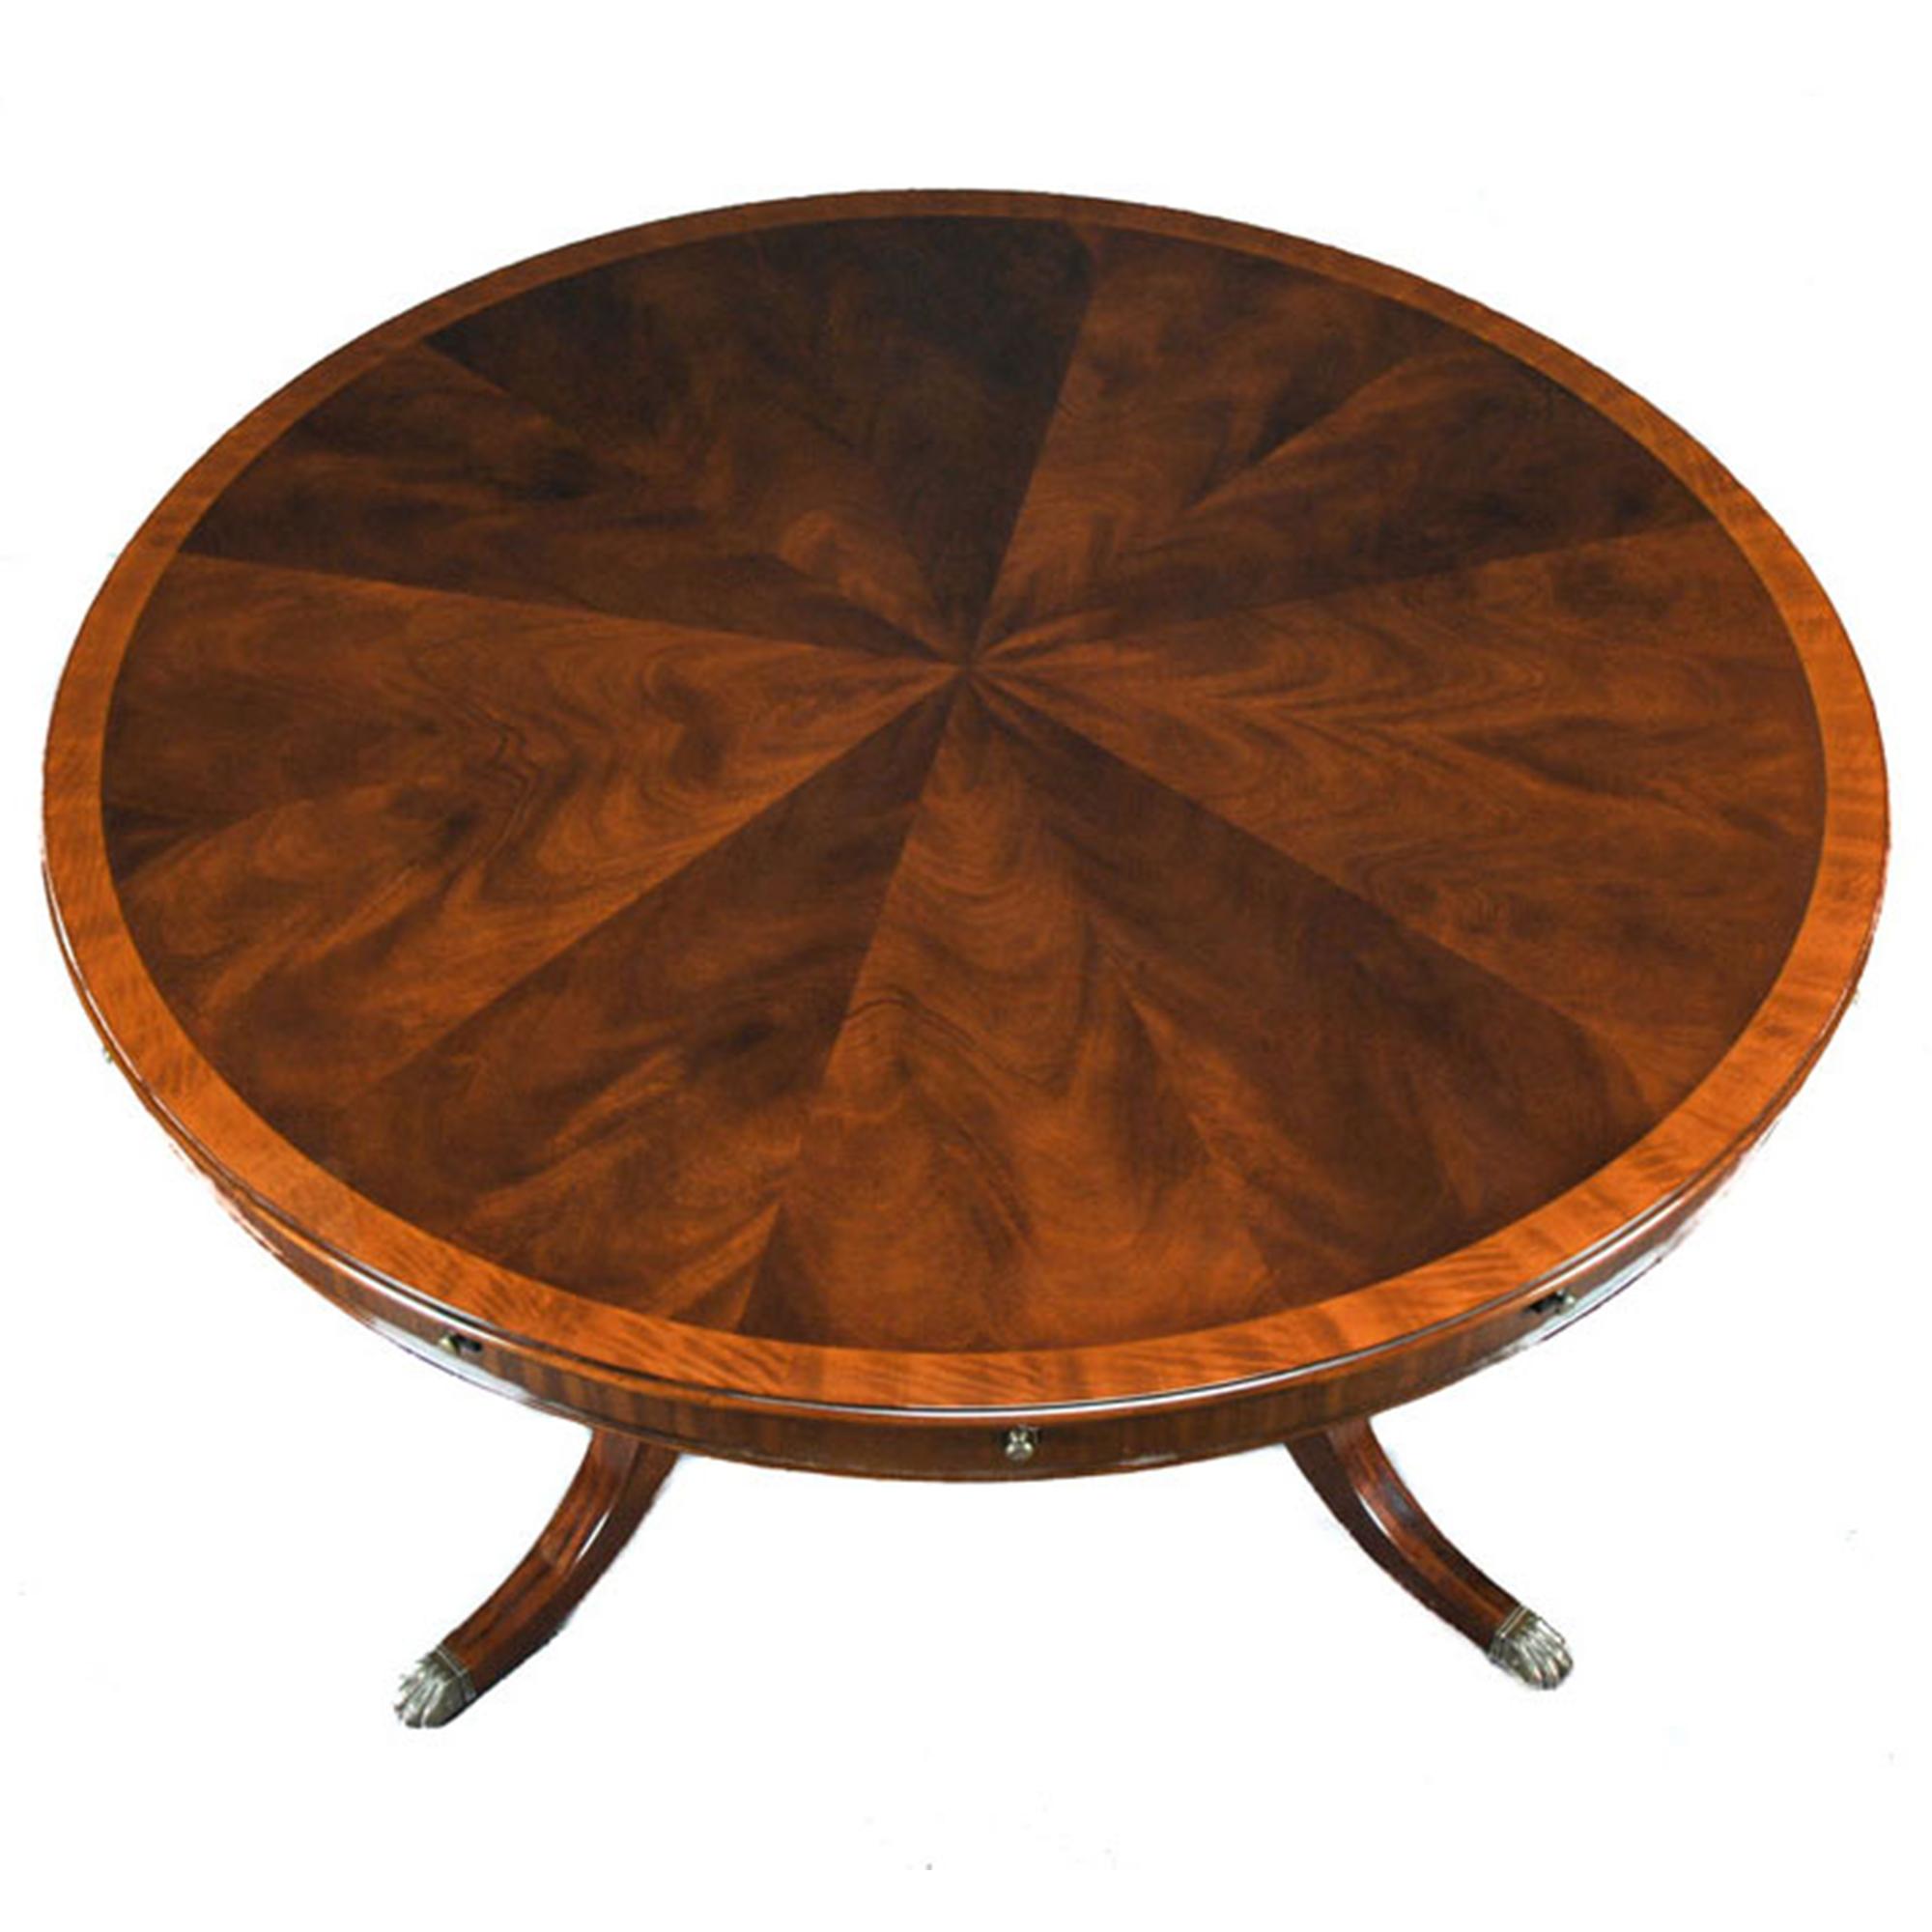 84 inch Round Perimeter Table Niagara Furniture round  : NDRT047 1 from niagarafurniture.com size 2000 x 2000 jpeg 916kB